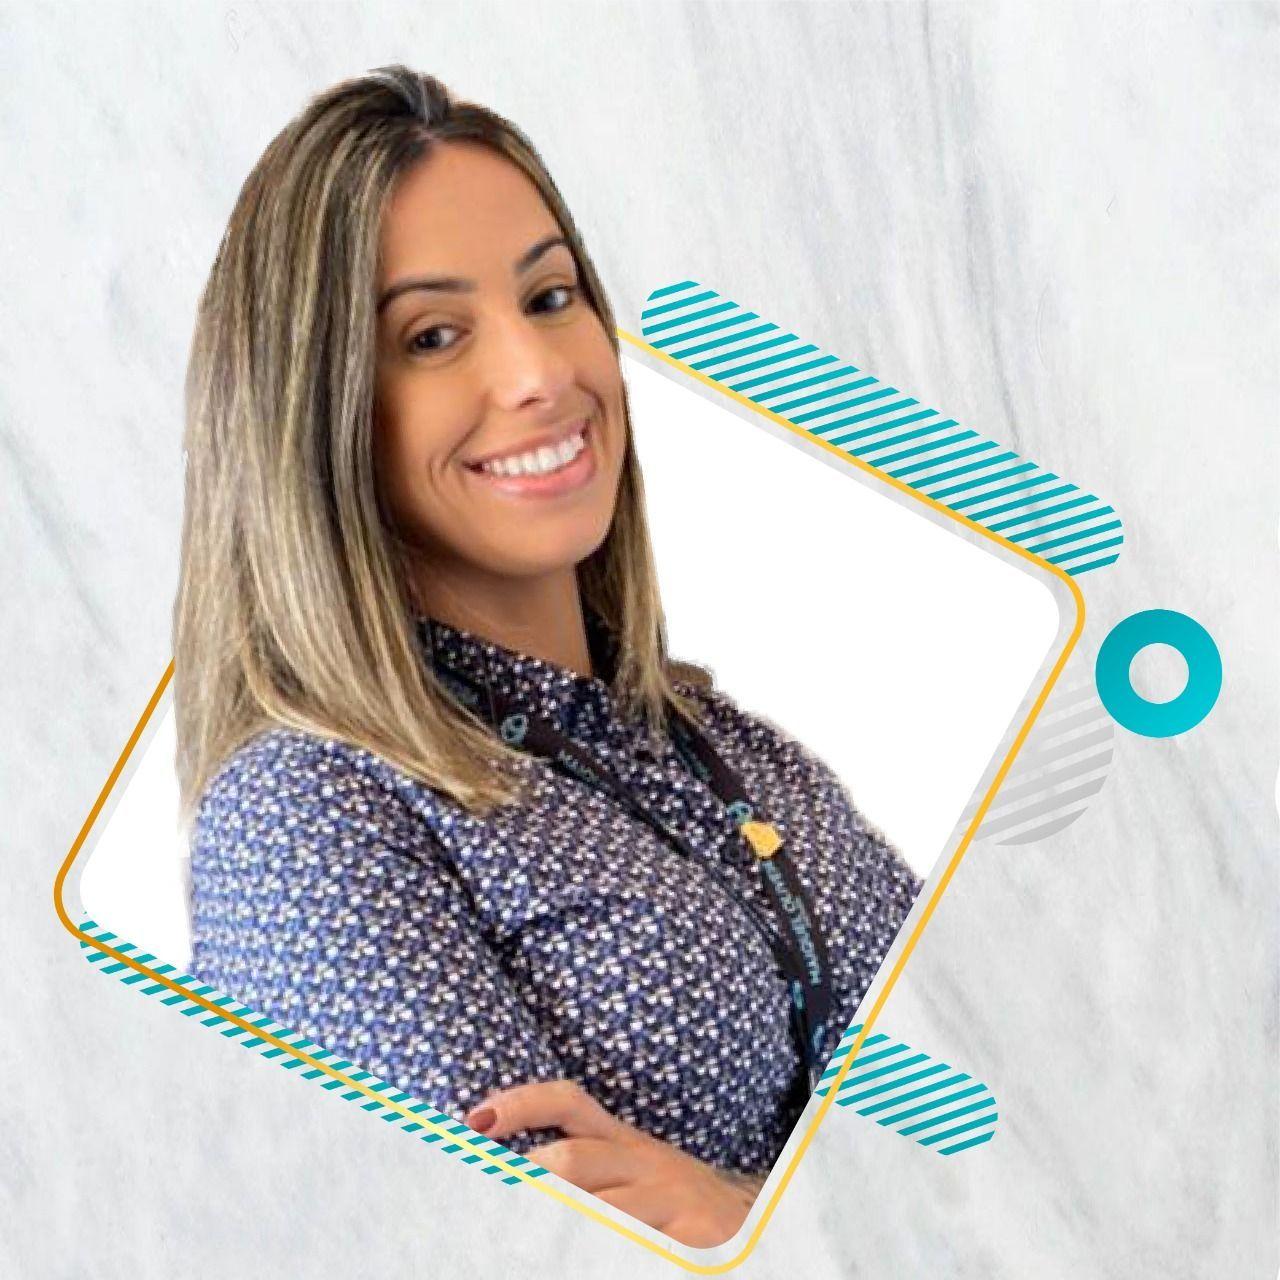 Marianne Machado Guimarães